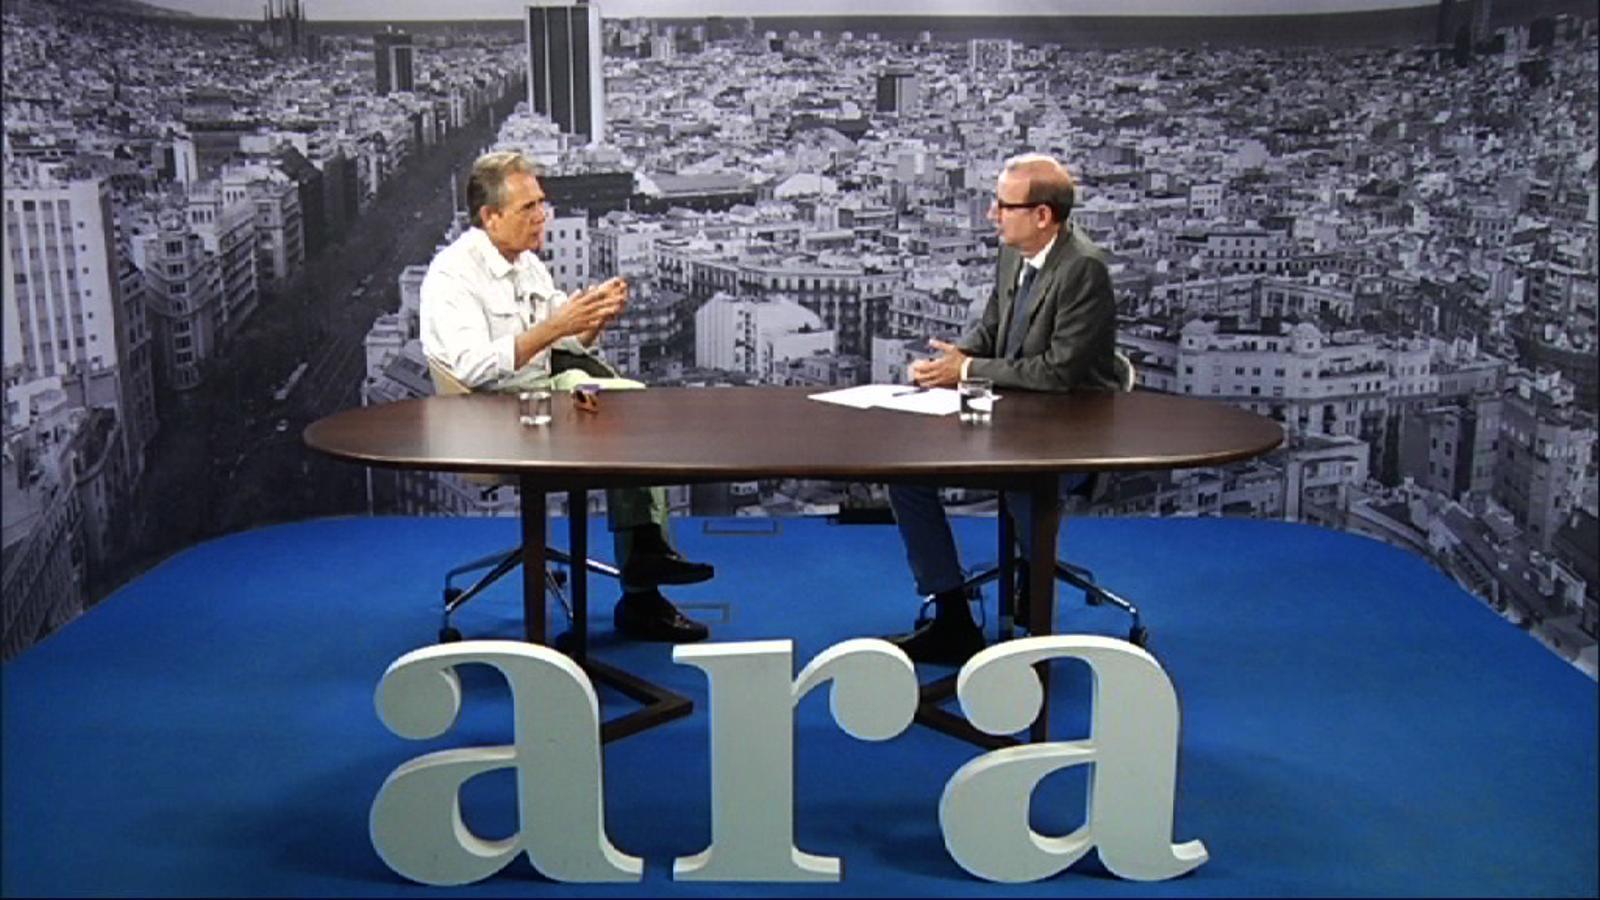 Entrevista d'Antoni Bassas a Joan Pere Viladecans